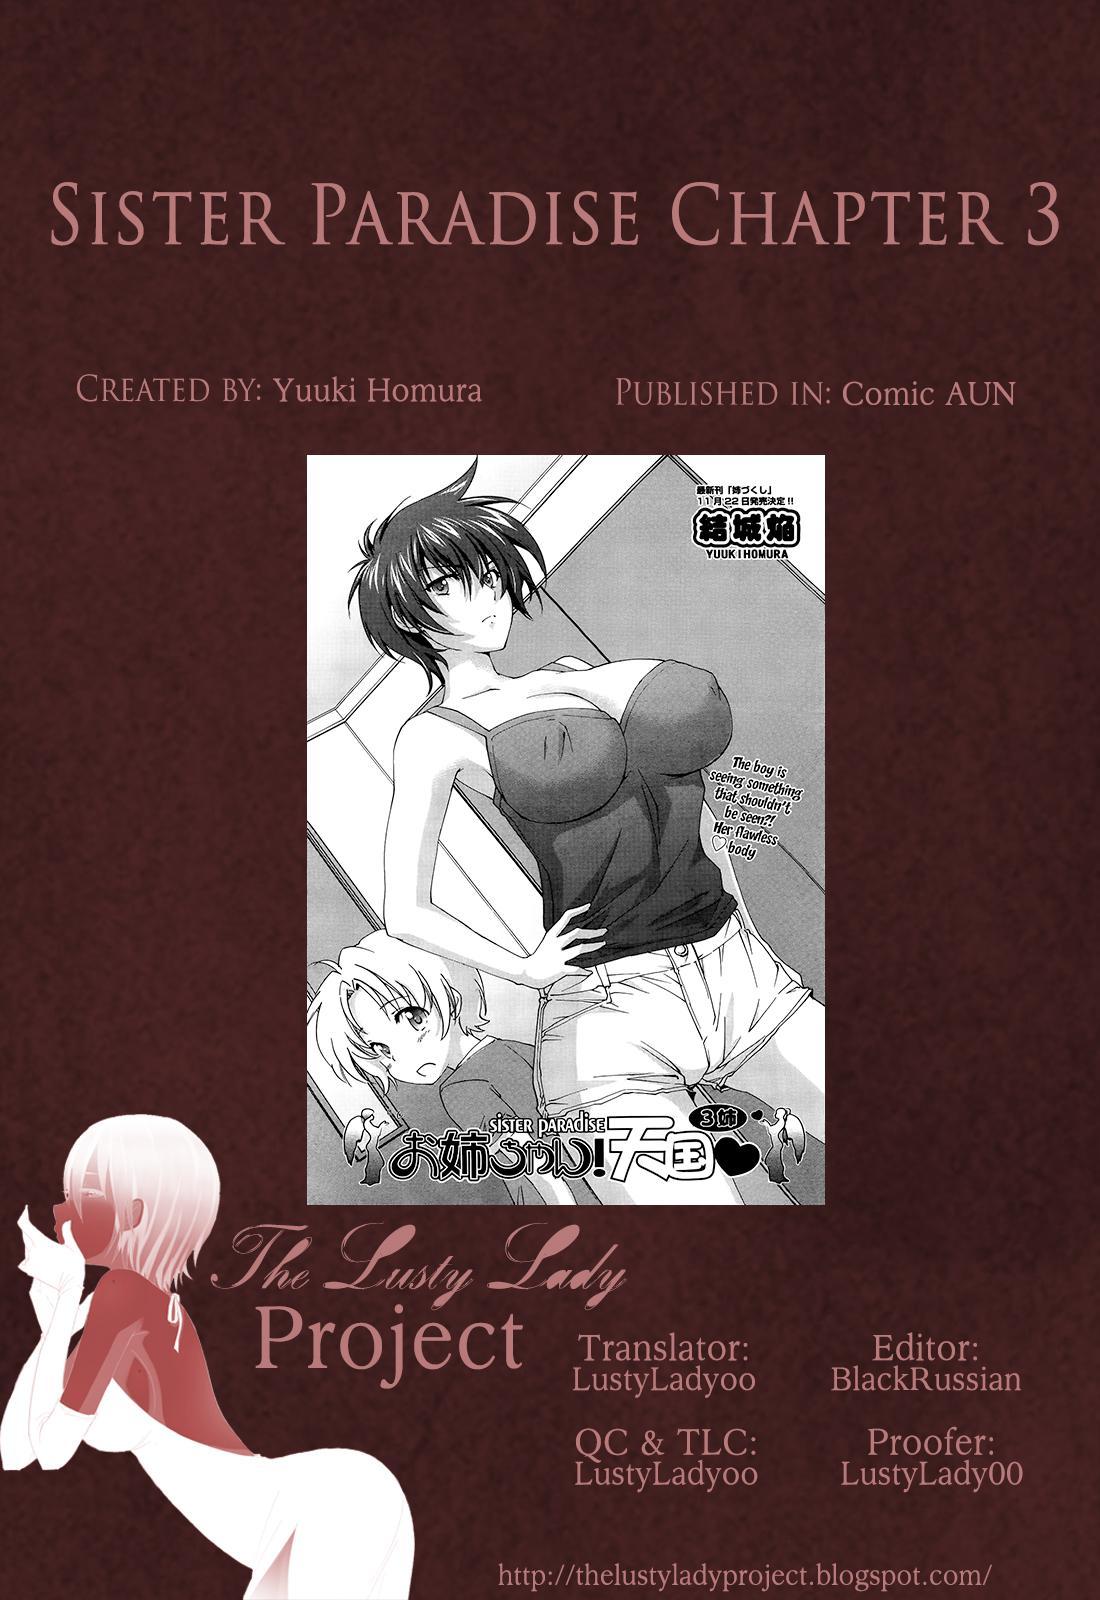 [Yuuki Homura] Onee-chan! Tengoku   Sister Paradise Ch. 1-4 [English] [The Lusty Lady Project] [Decensored] 68